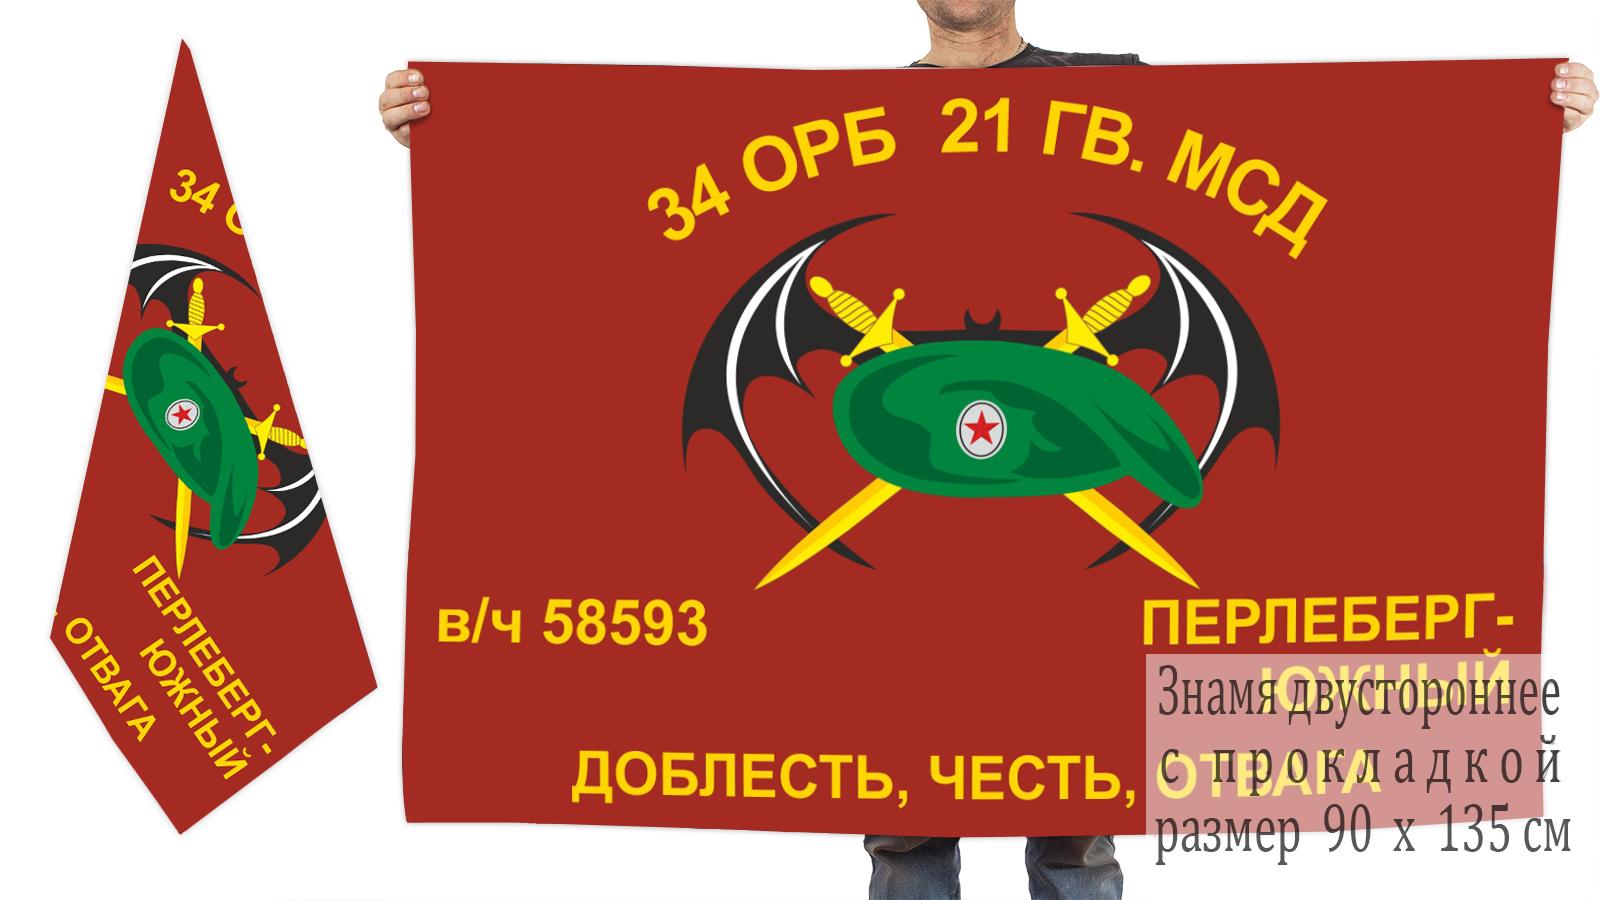 Двусторонний флаг 34 отдельного разведбата 21 гвардейской МСД